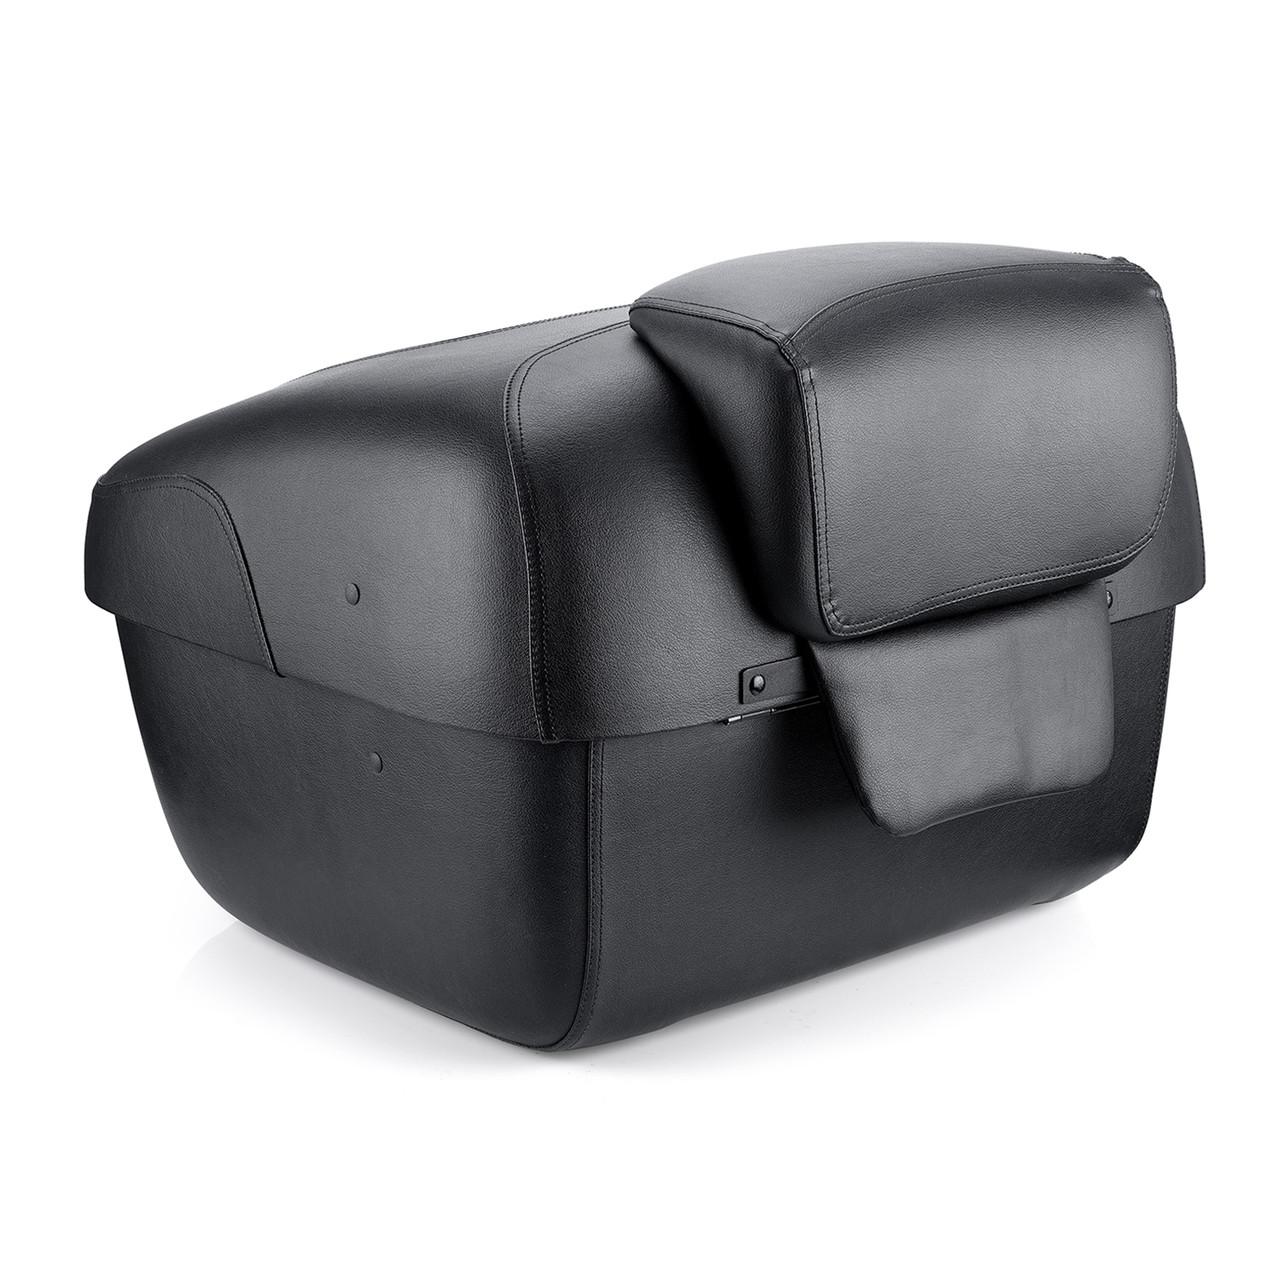 Viking Premium Leather Wrapped Hard Trunk Upper Image